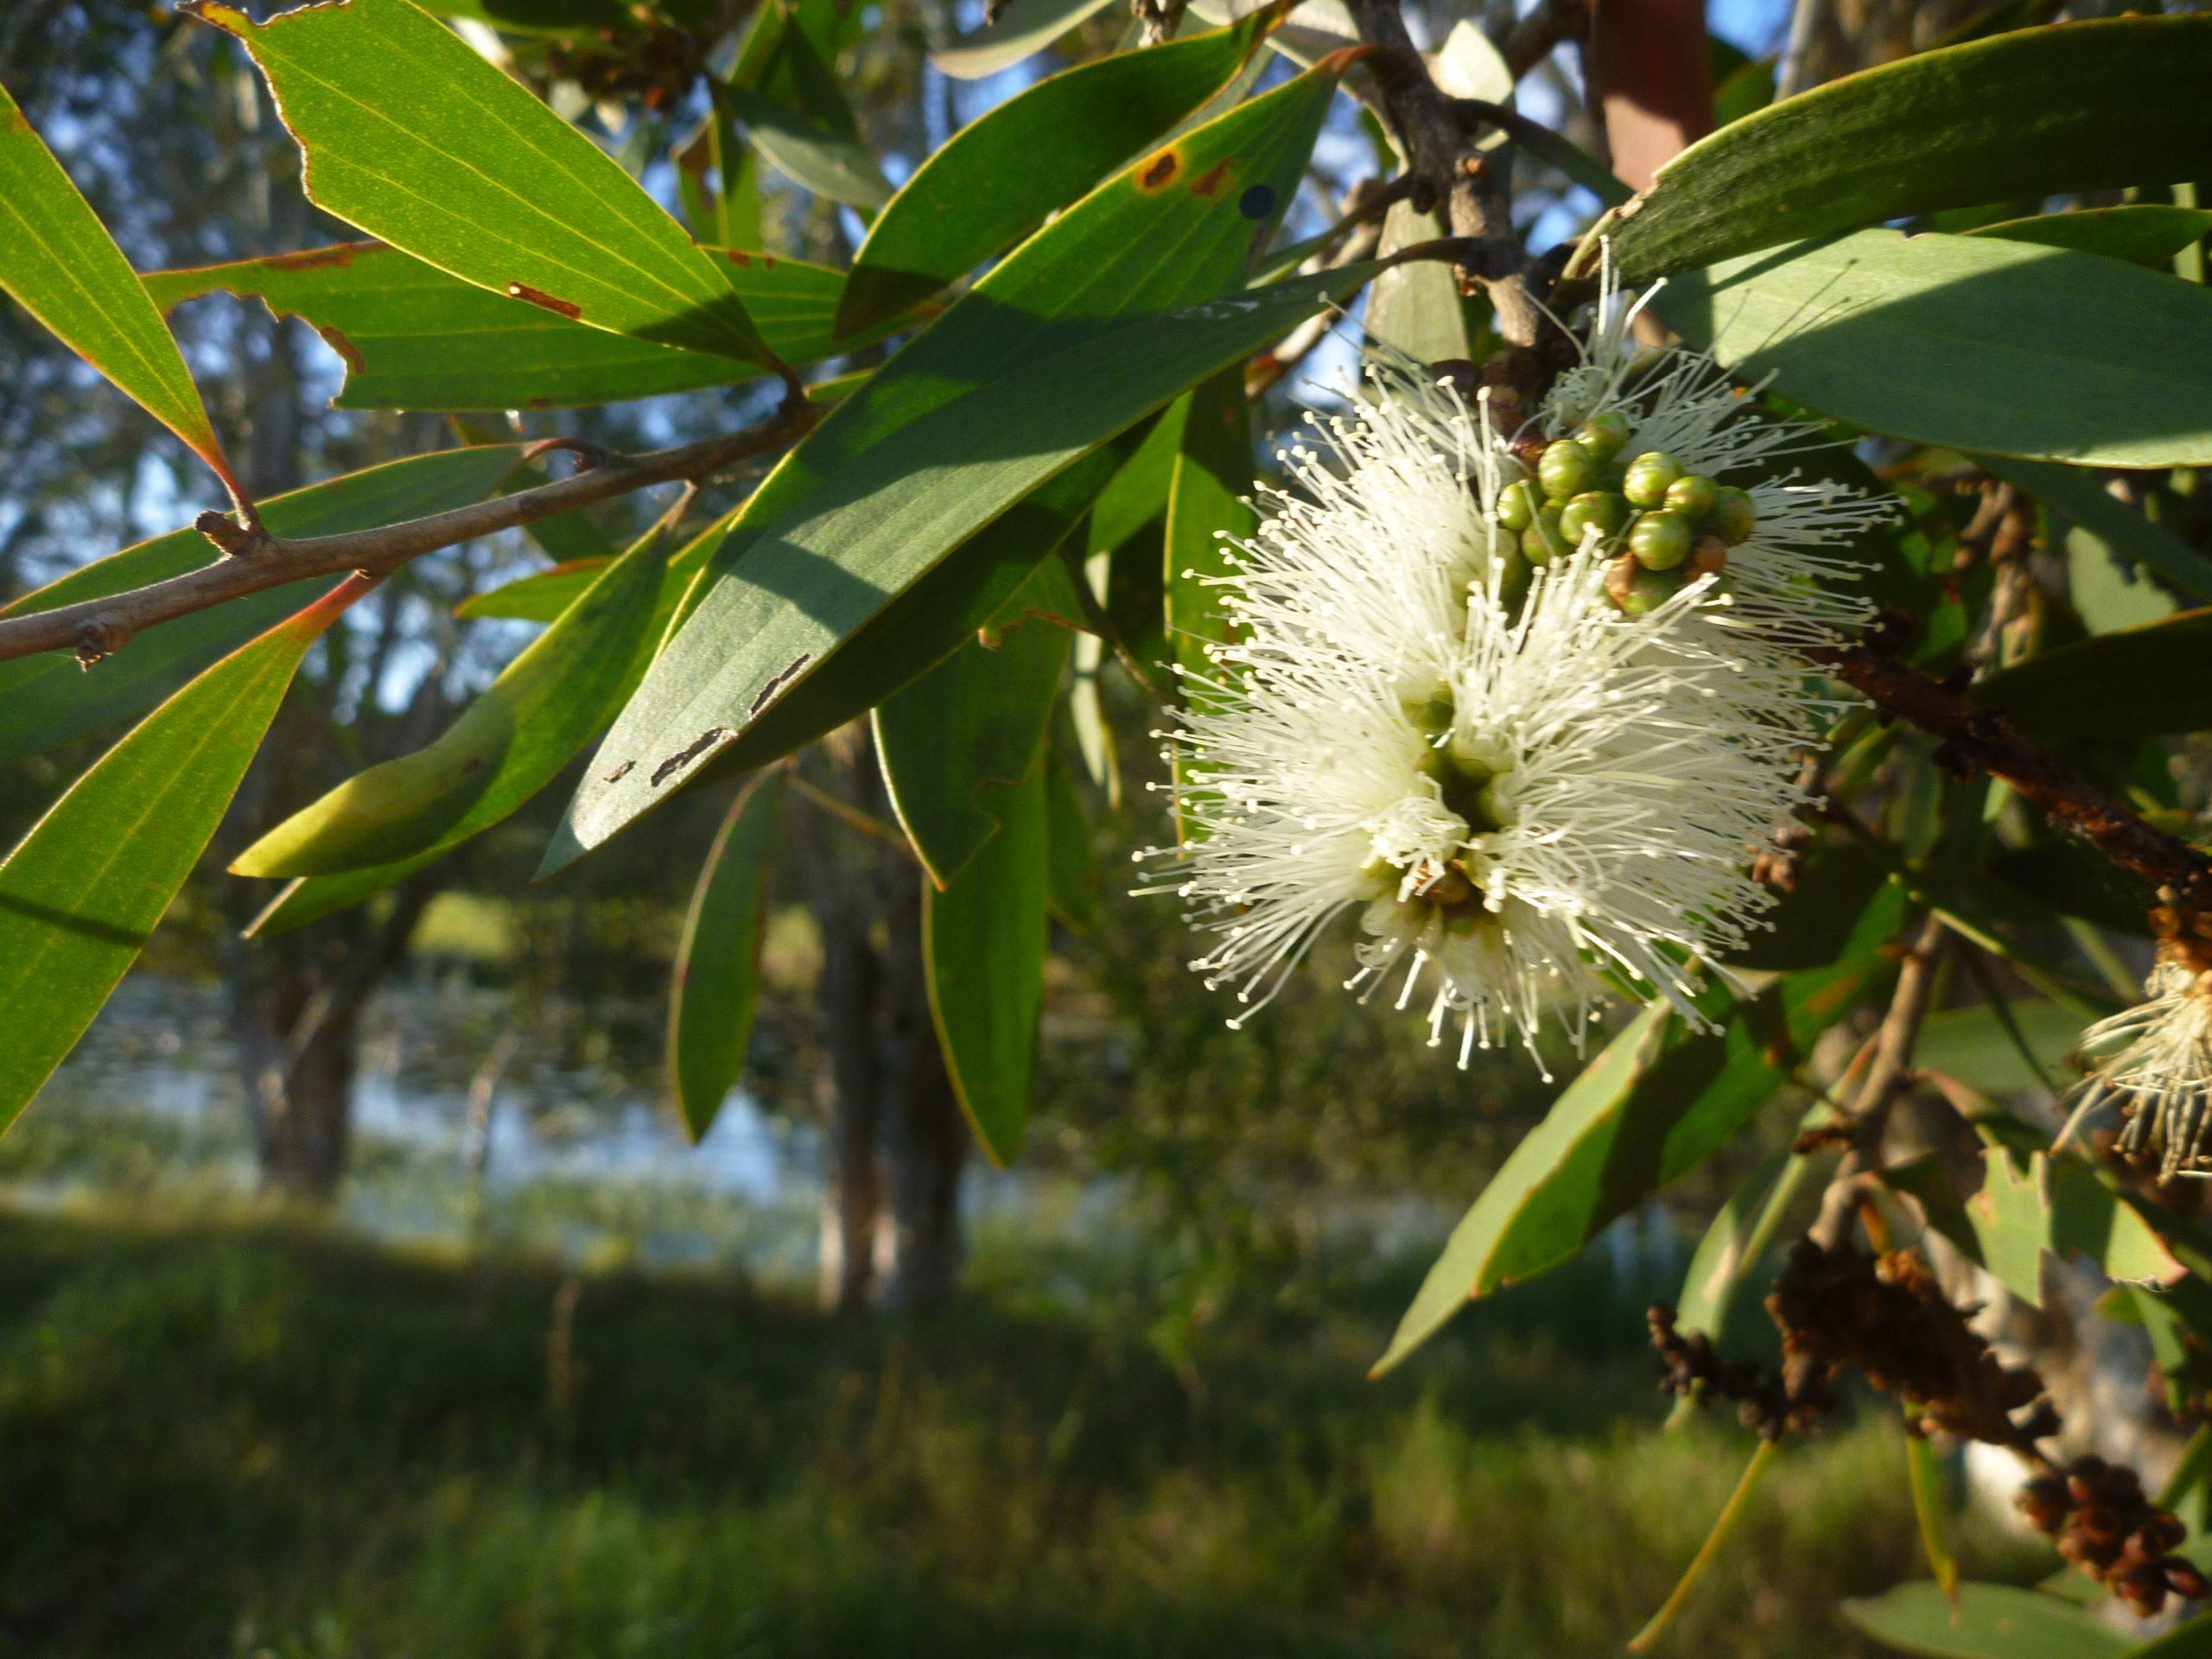 Nerolina flower